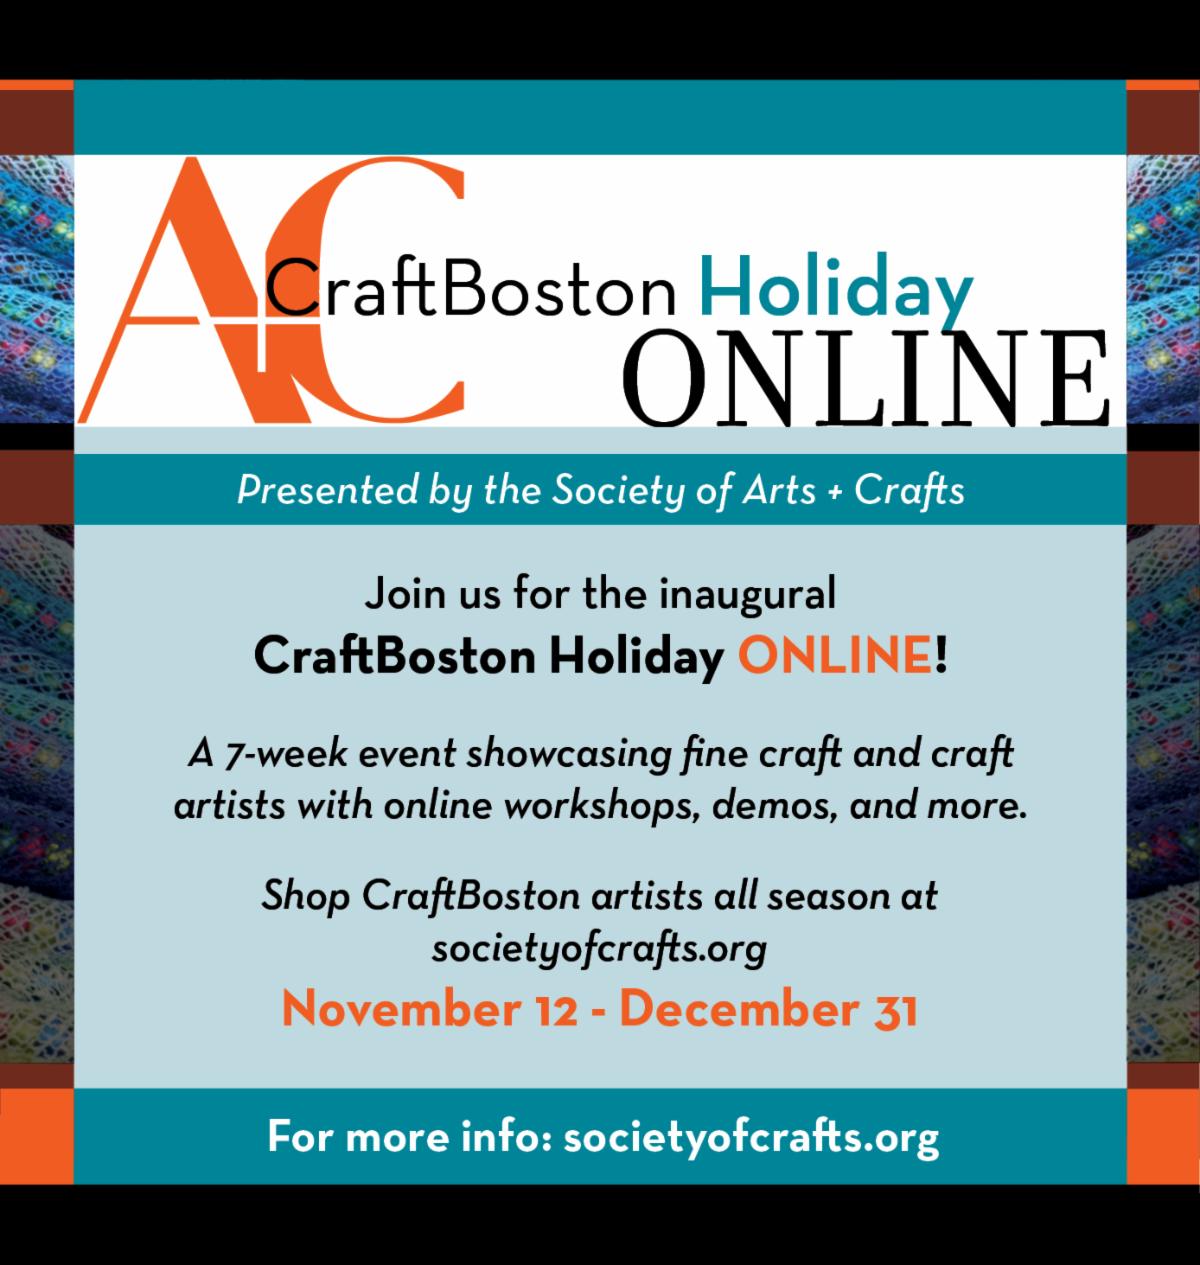 Society of Arts + Crafts